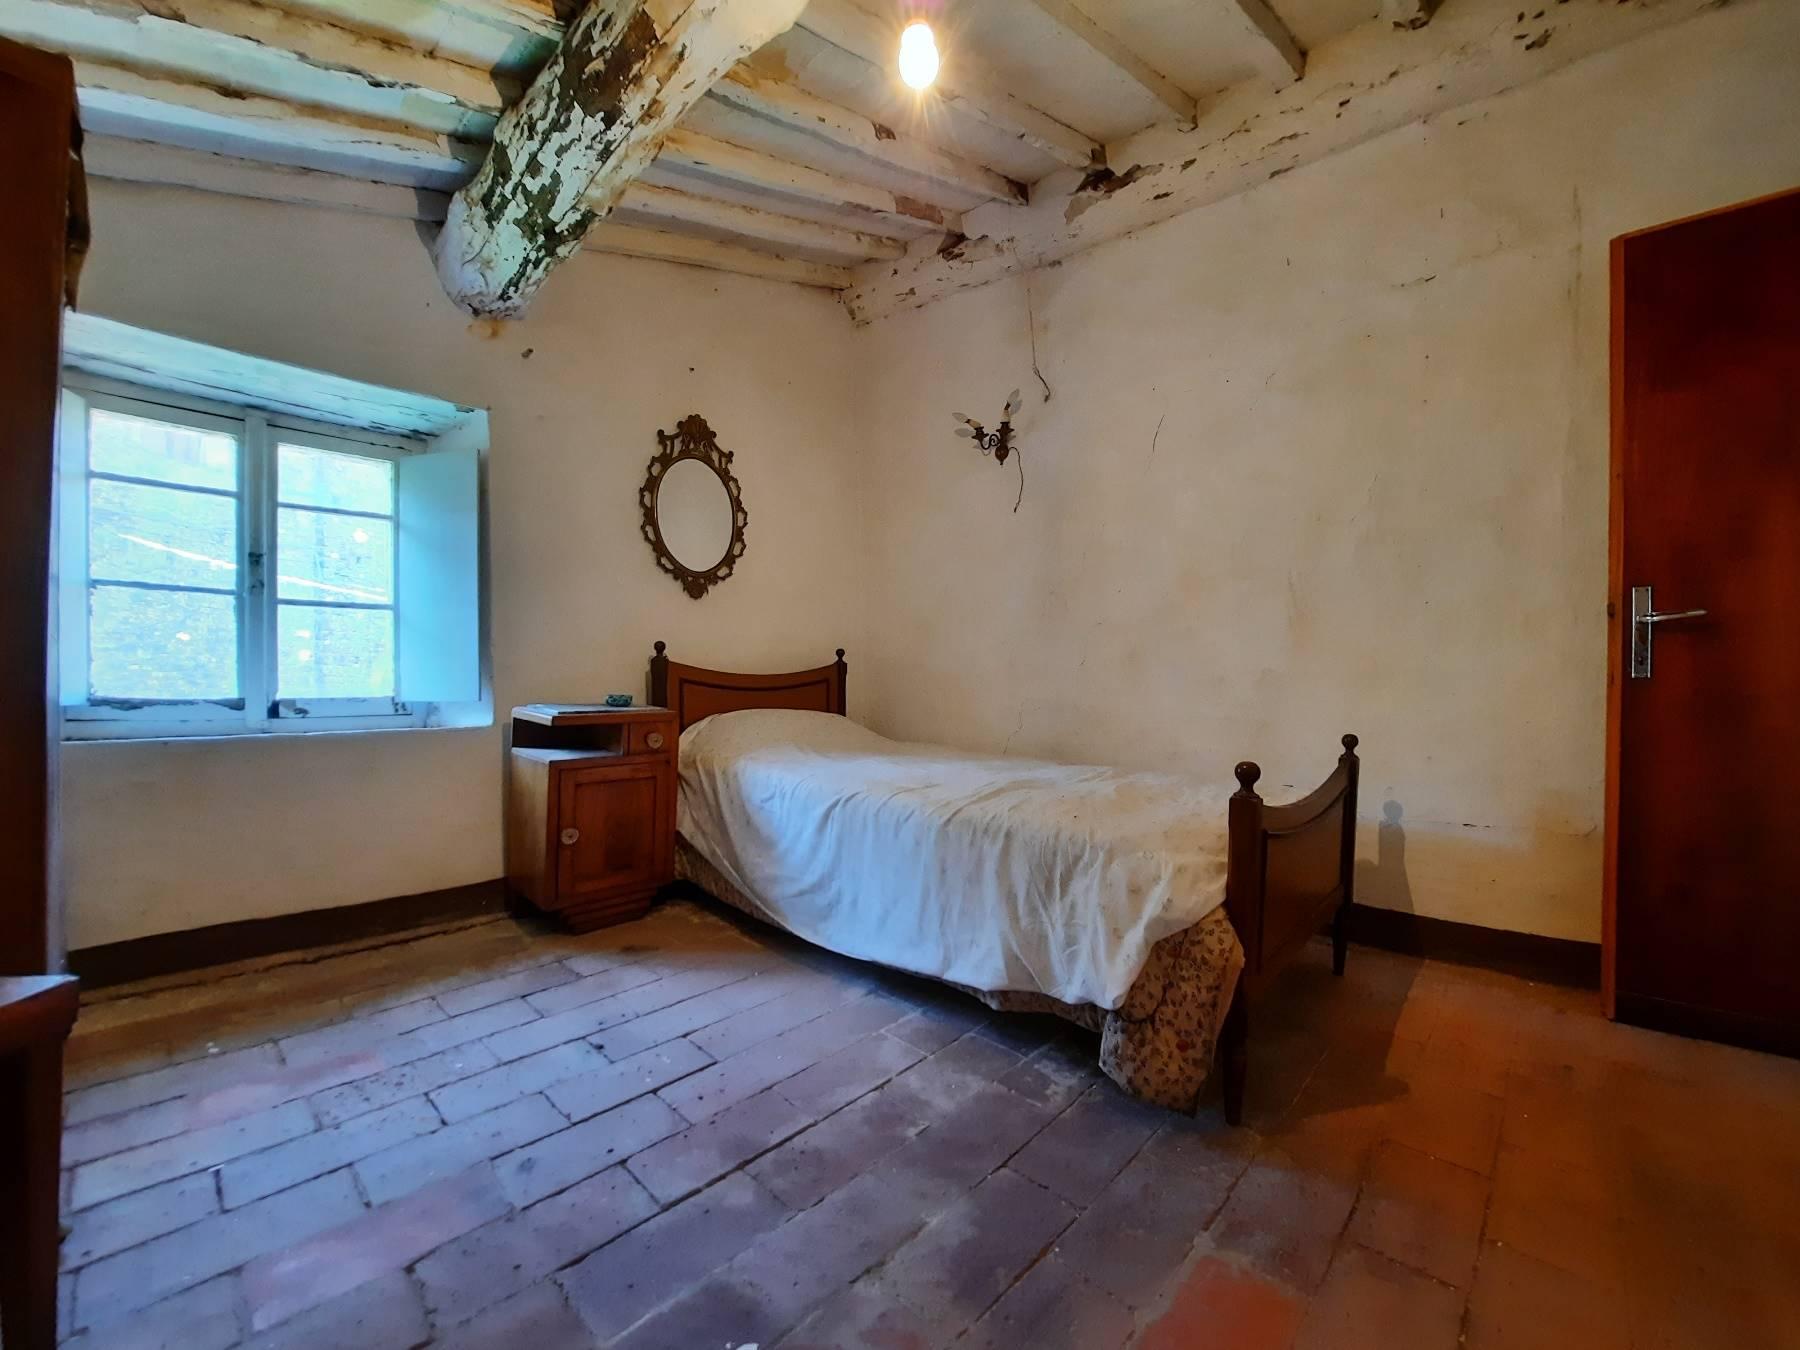 La camera 2 - The bedroom 2